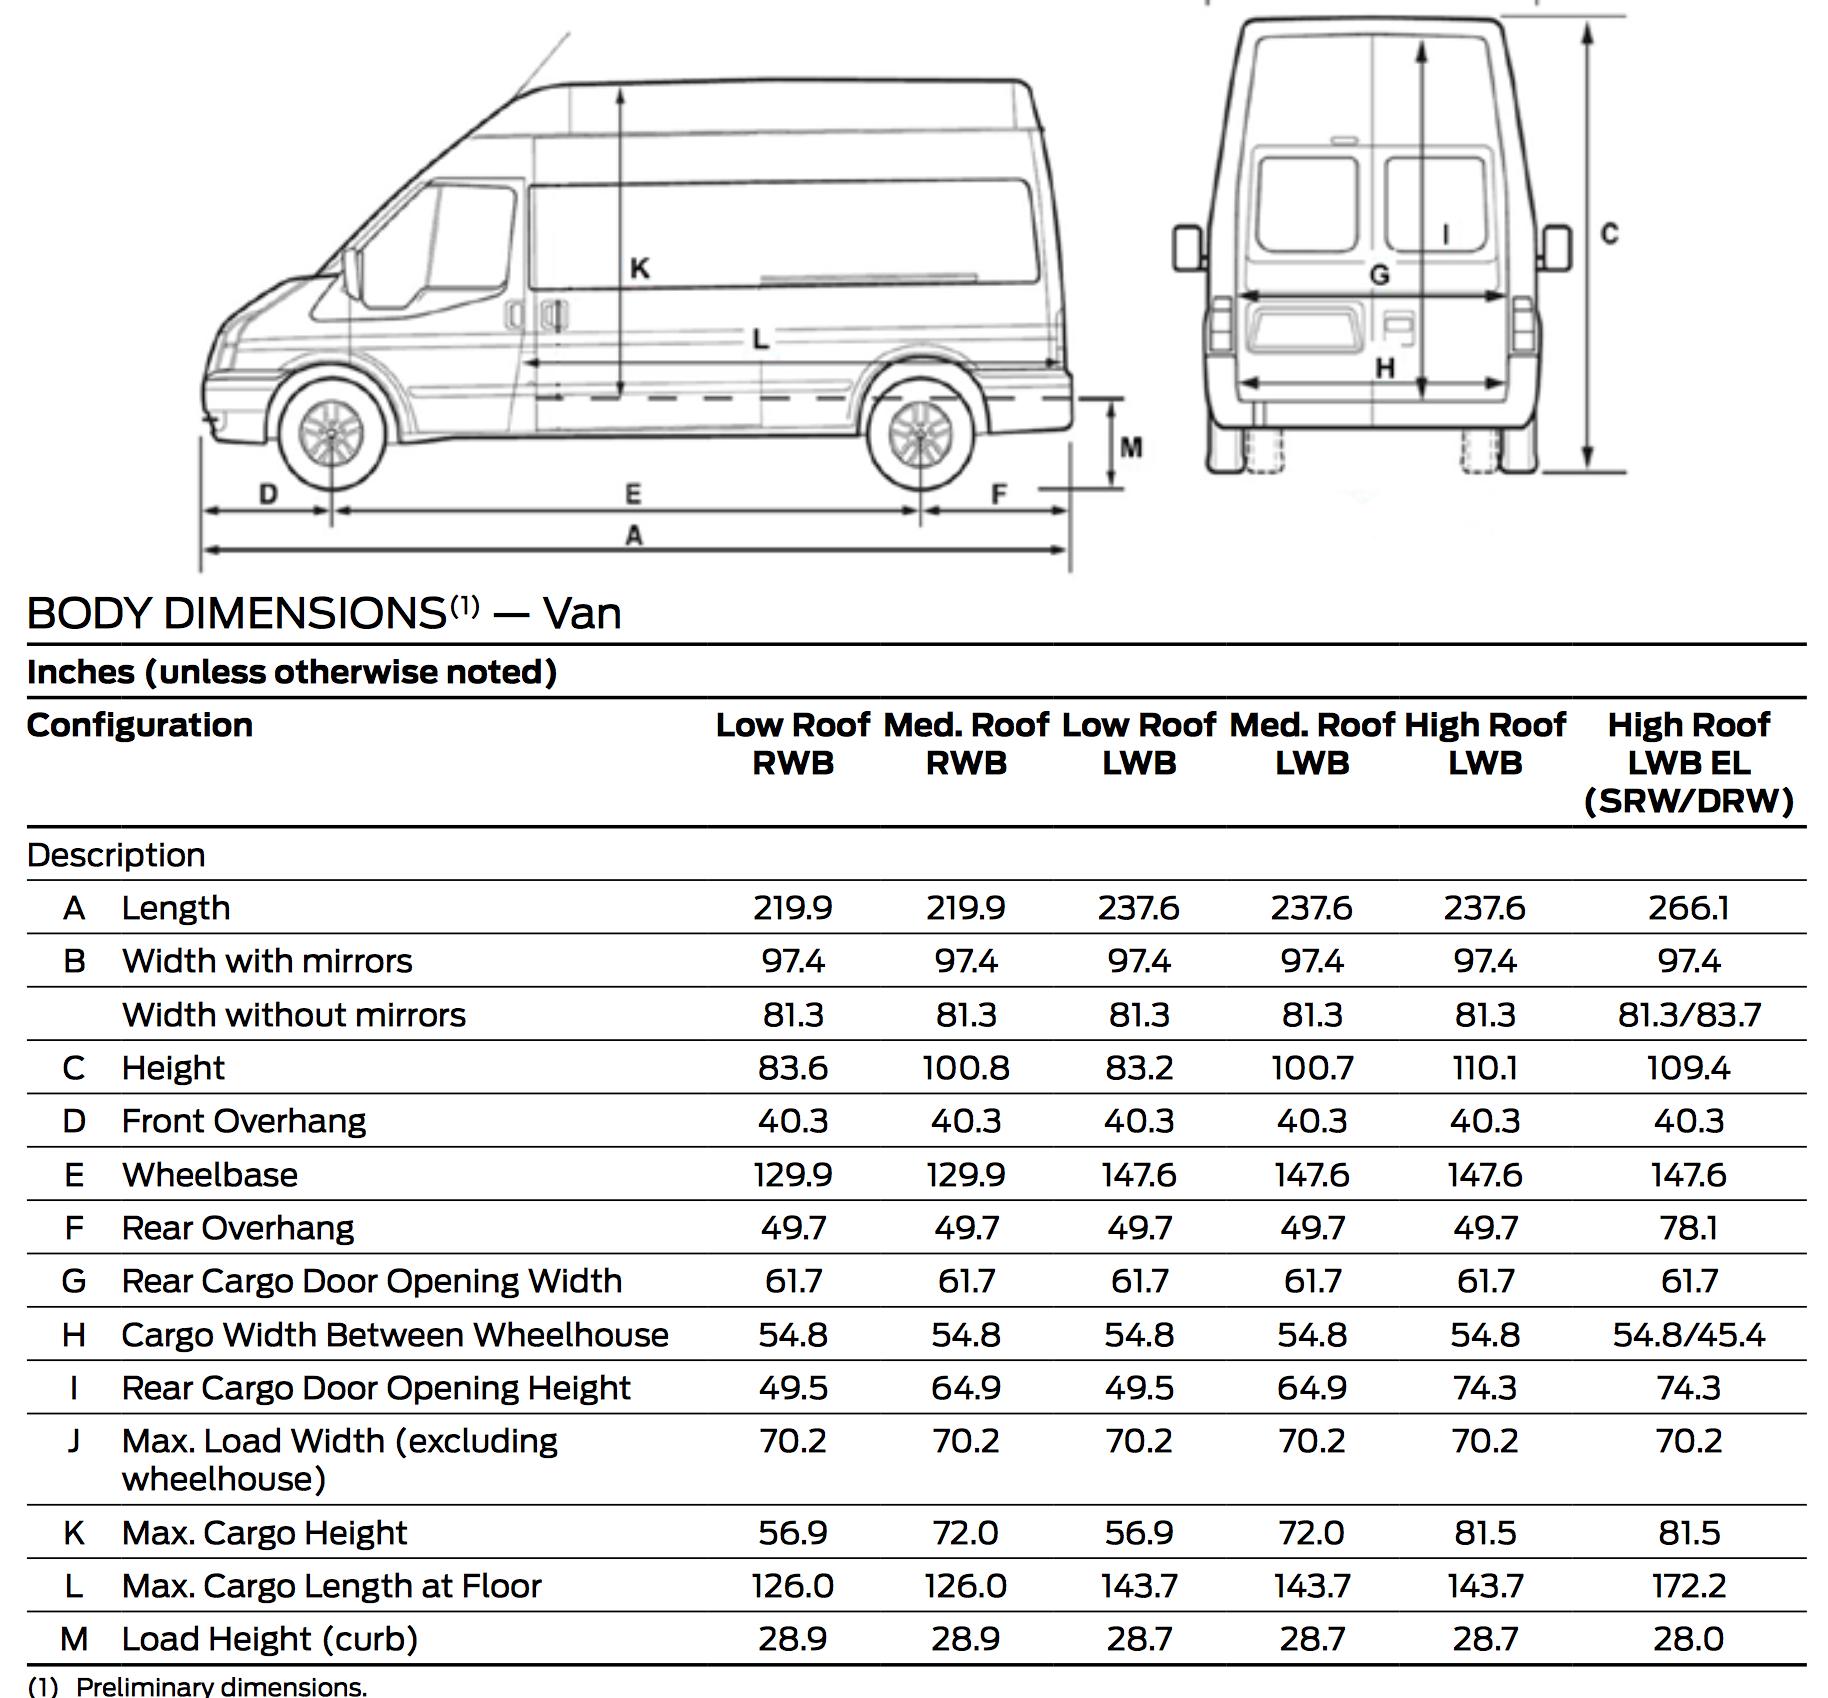 2017 Transit Connect: 2017 Ford Transit Van Interior Dimensions